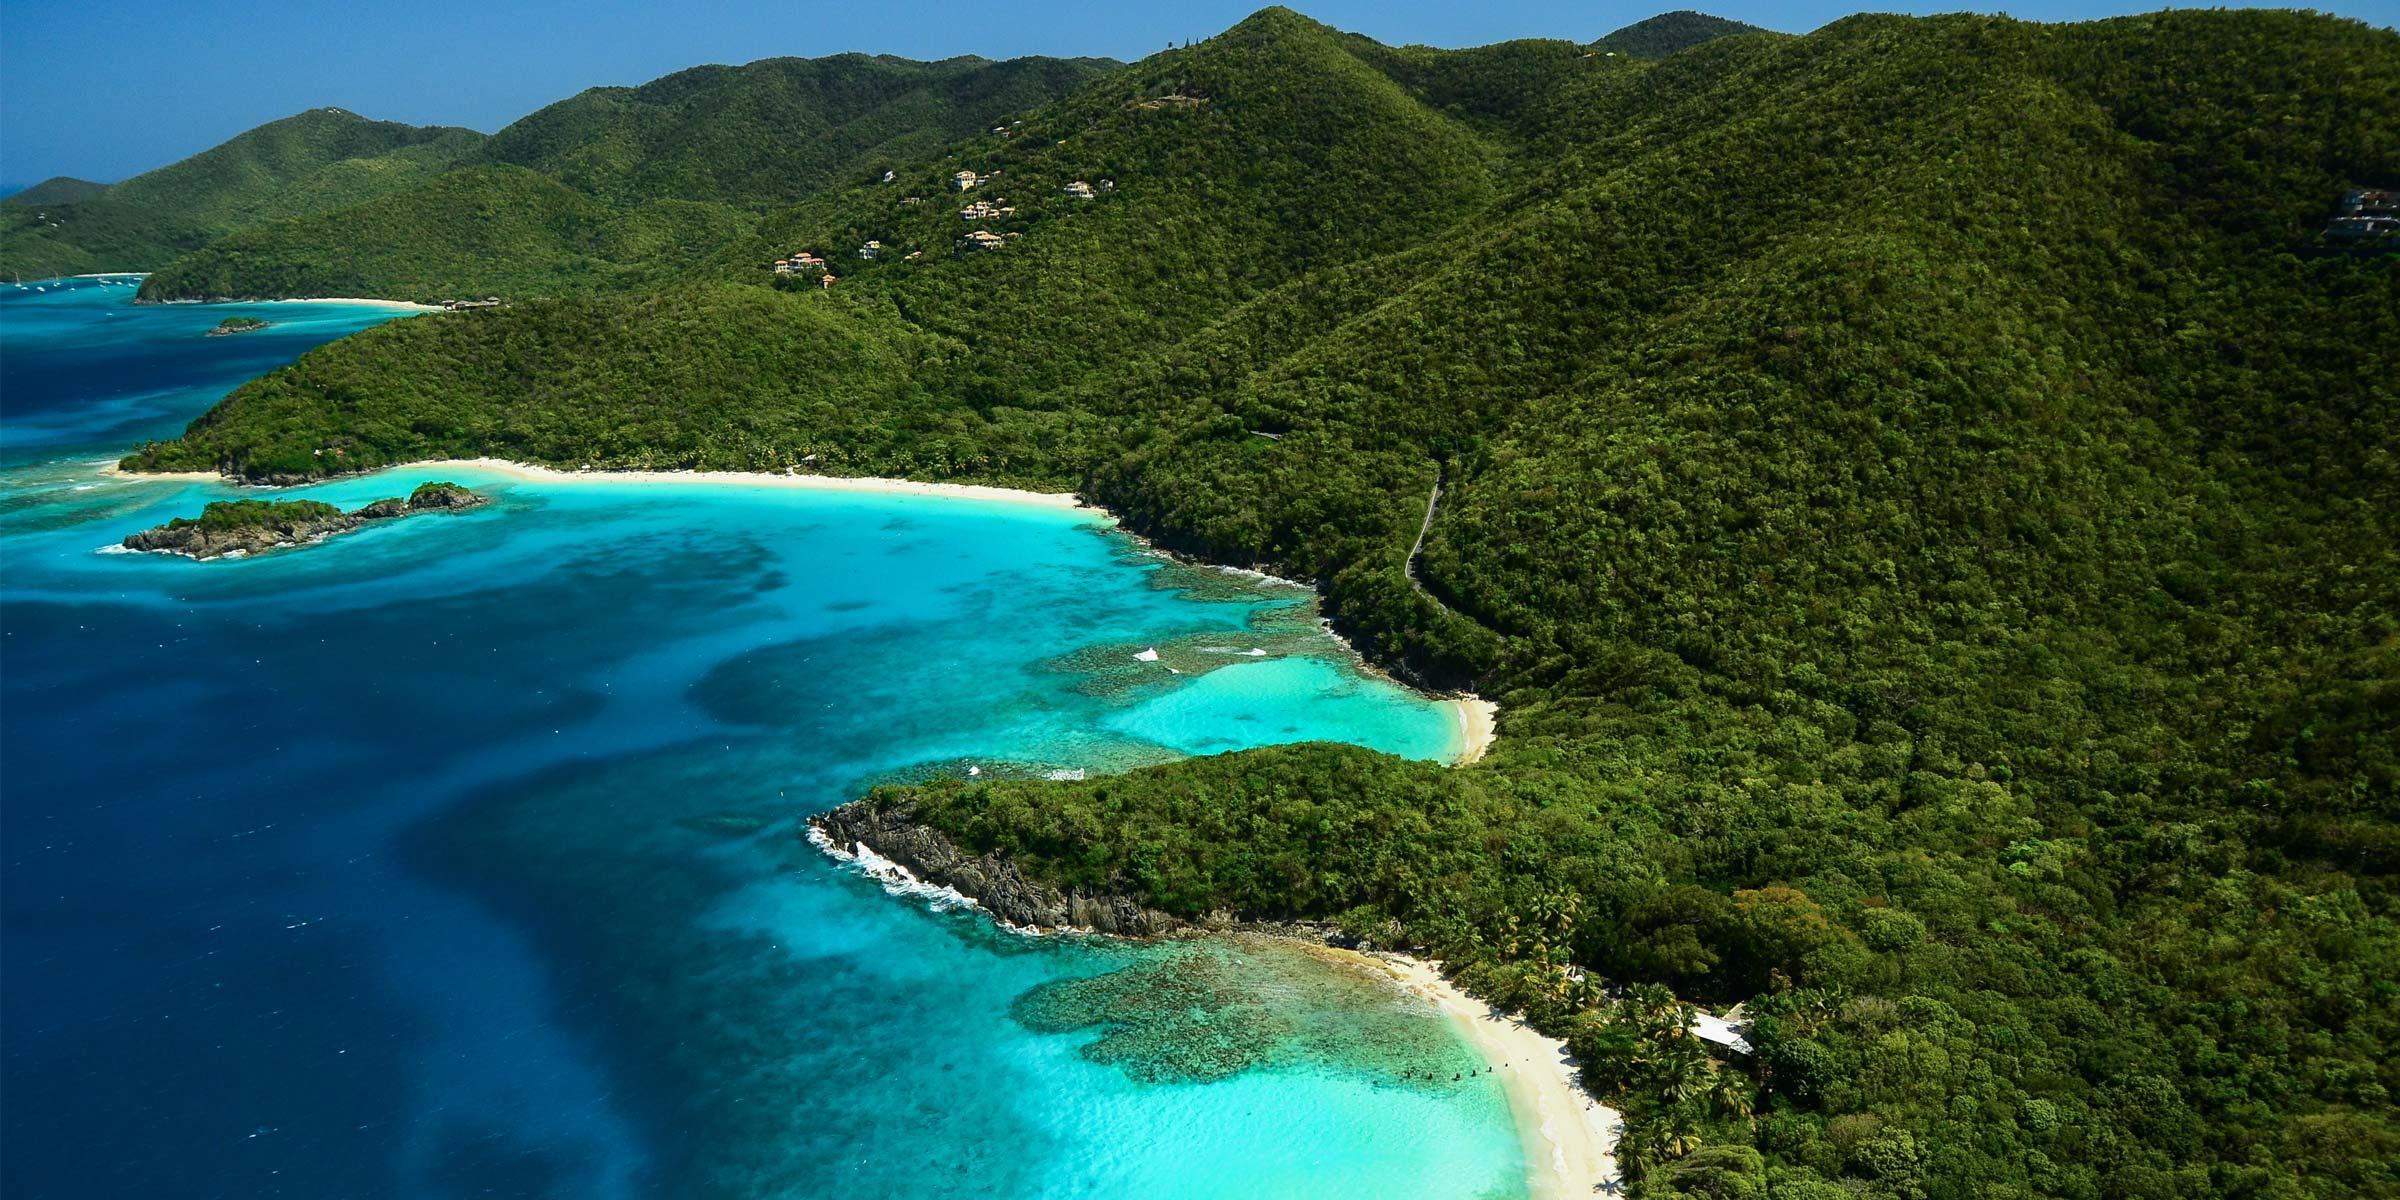 Denis Bay and Trunk Bay on St. John, U.S. Virgin Islands